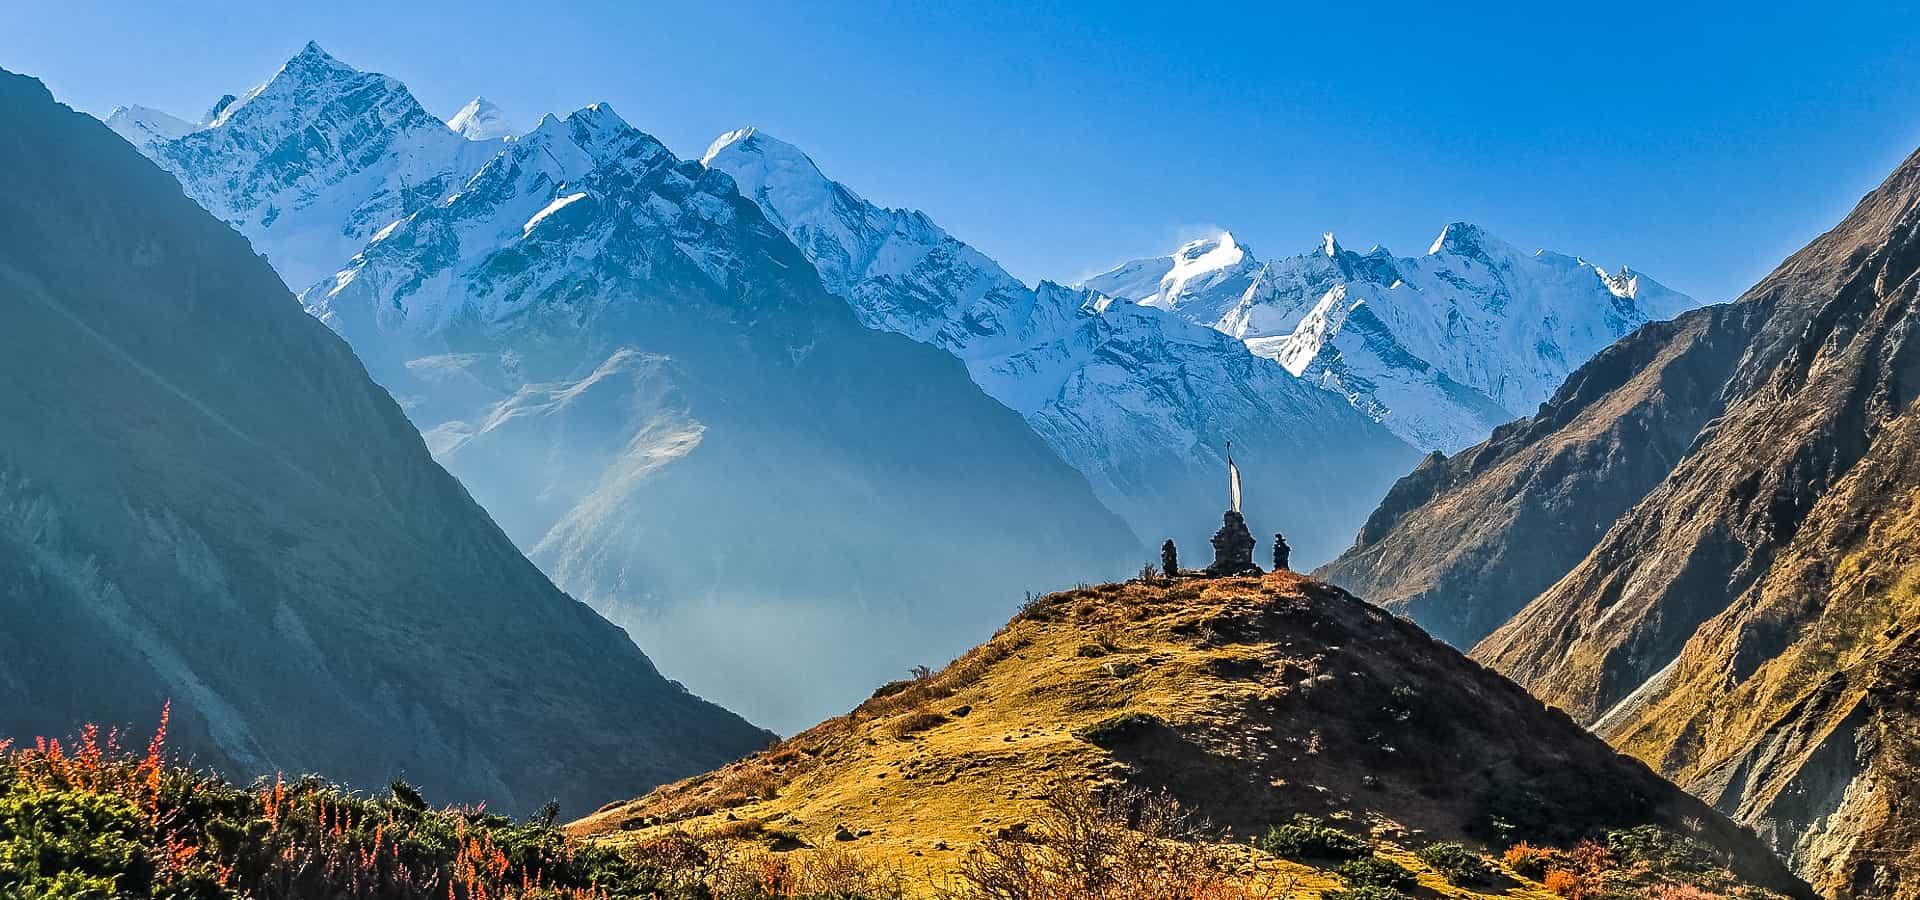 Tsum-Valley-Trek-in-Nepal-Sodha-Travel